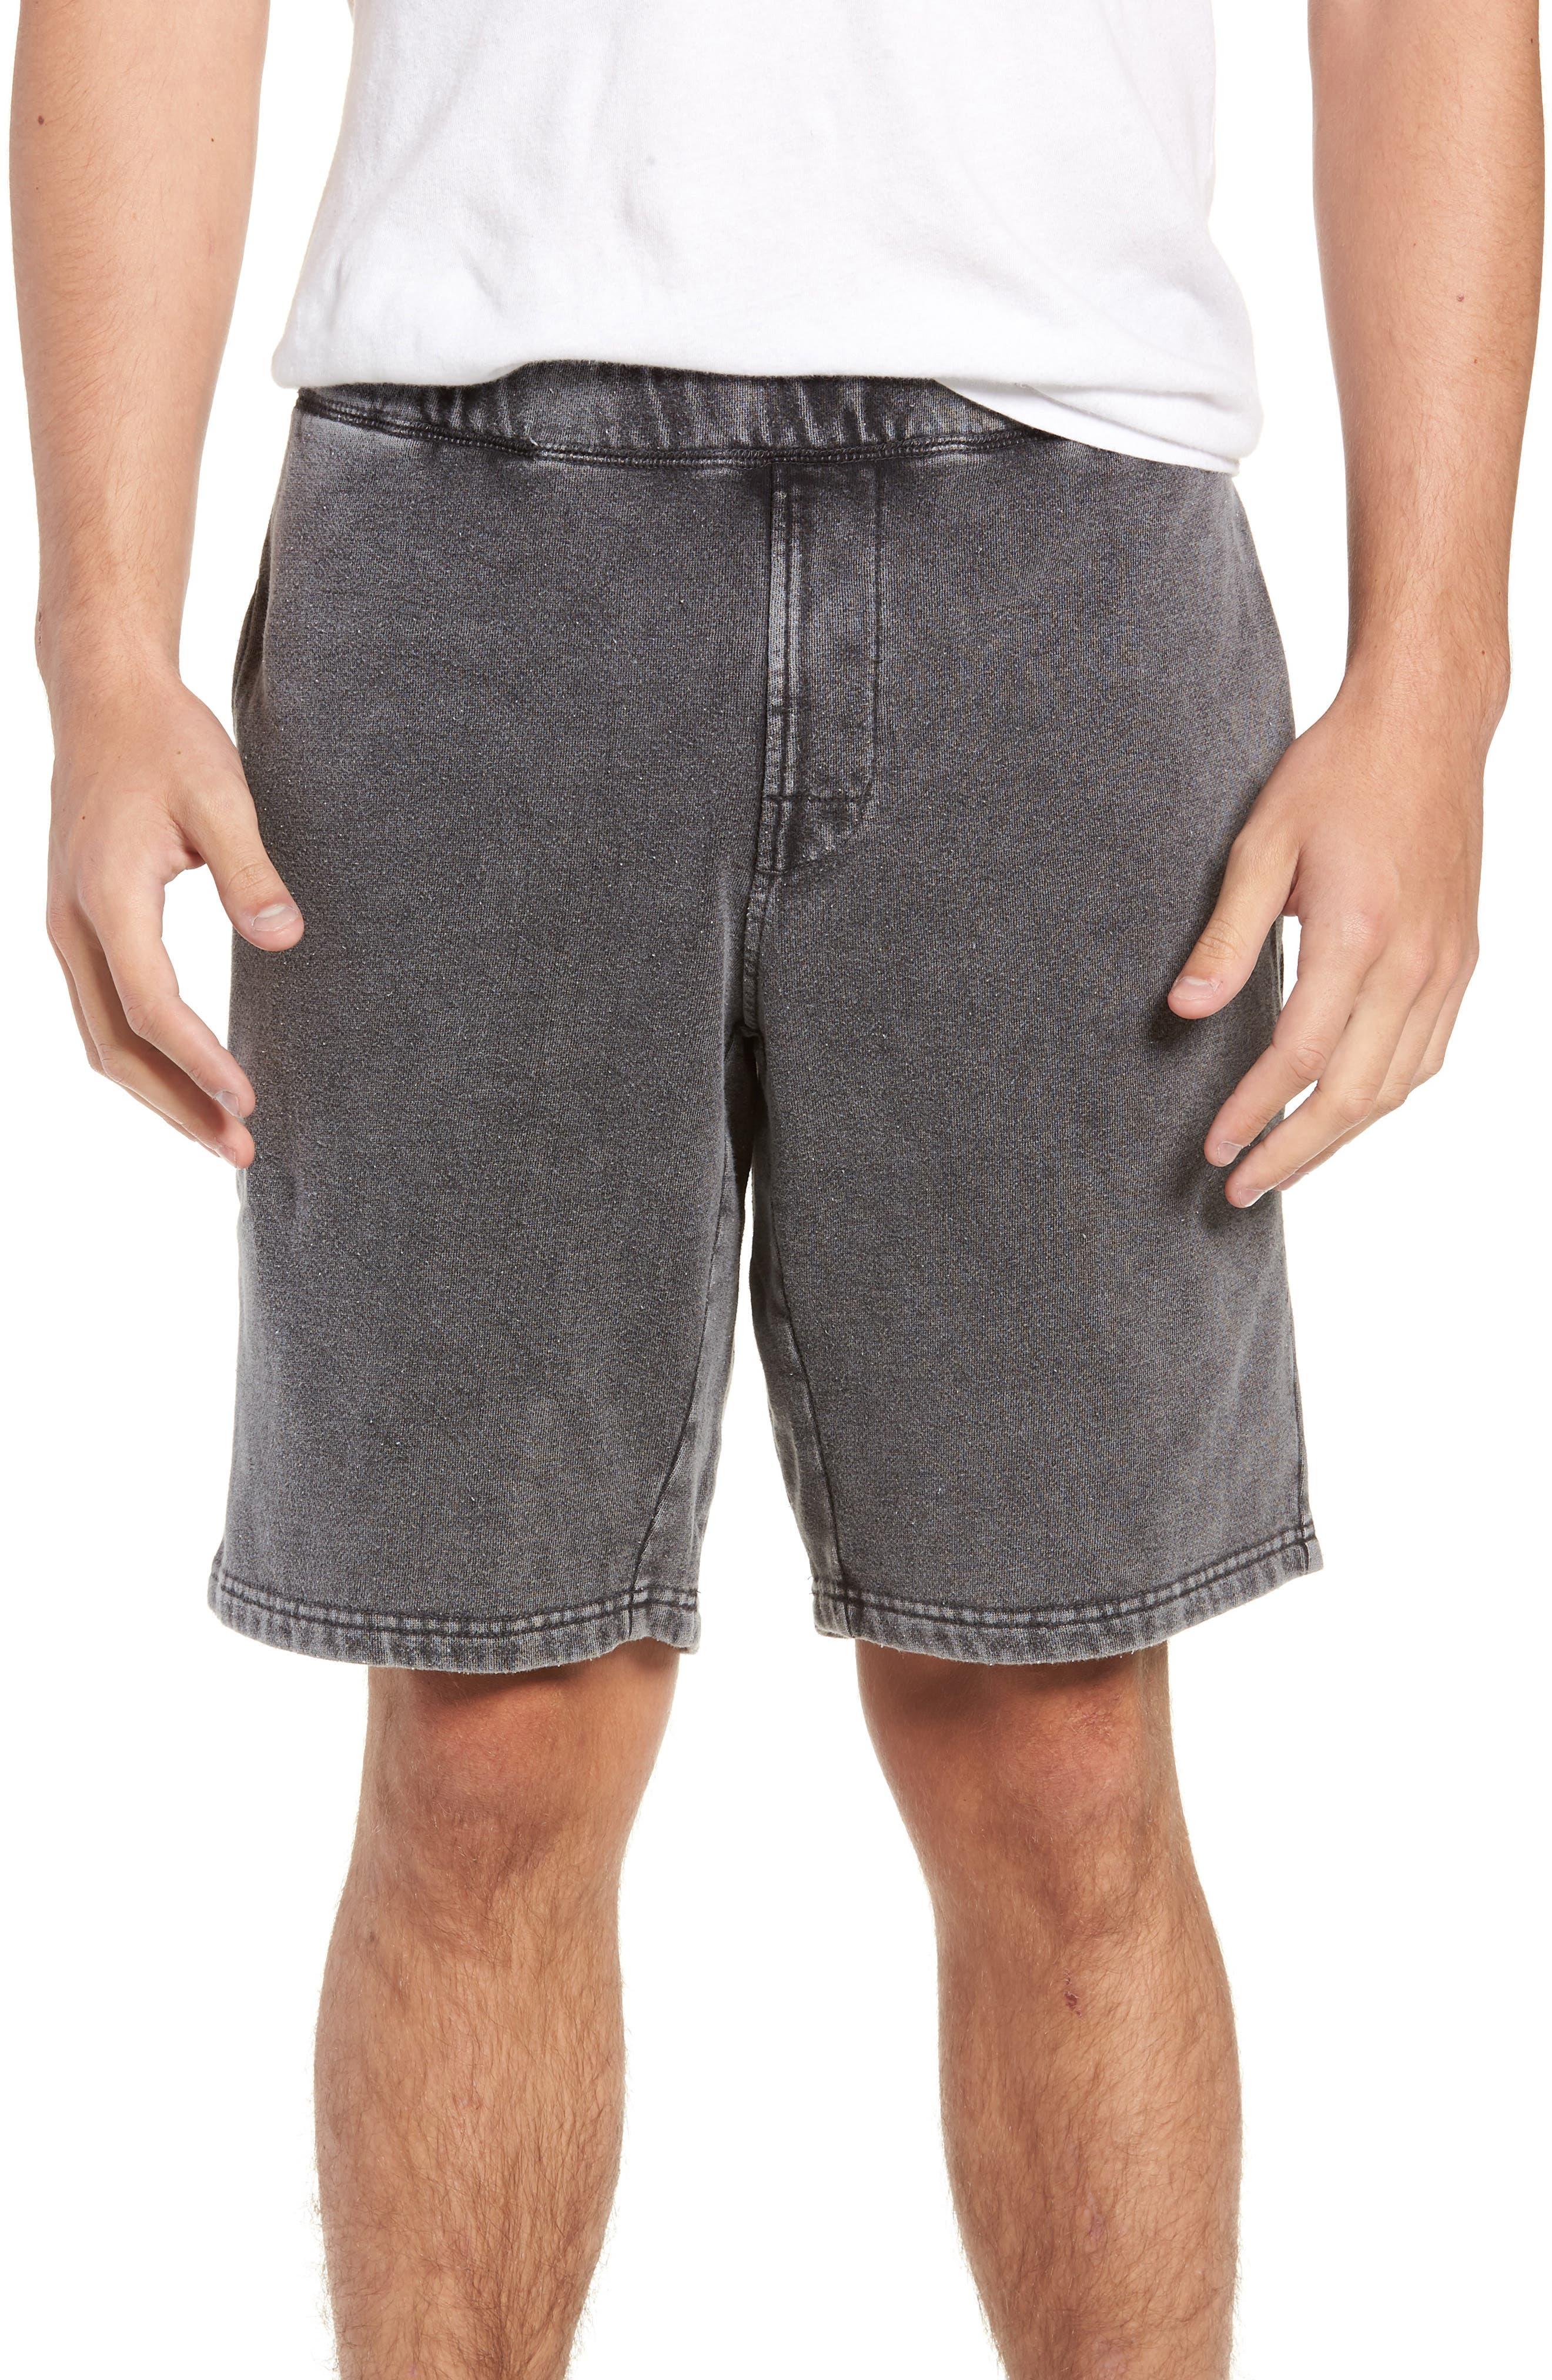 Matador Shorts,                             Main thumbnail 1, color,                             RVCA BLACK